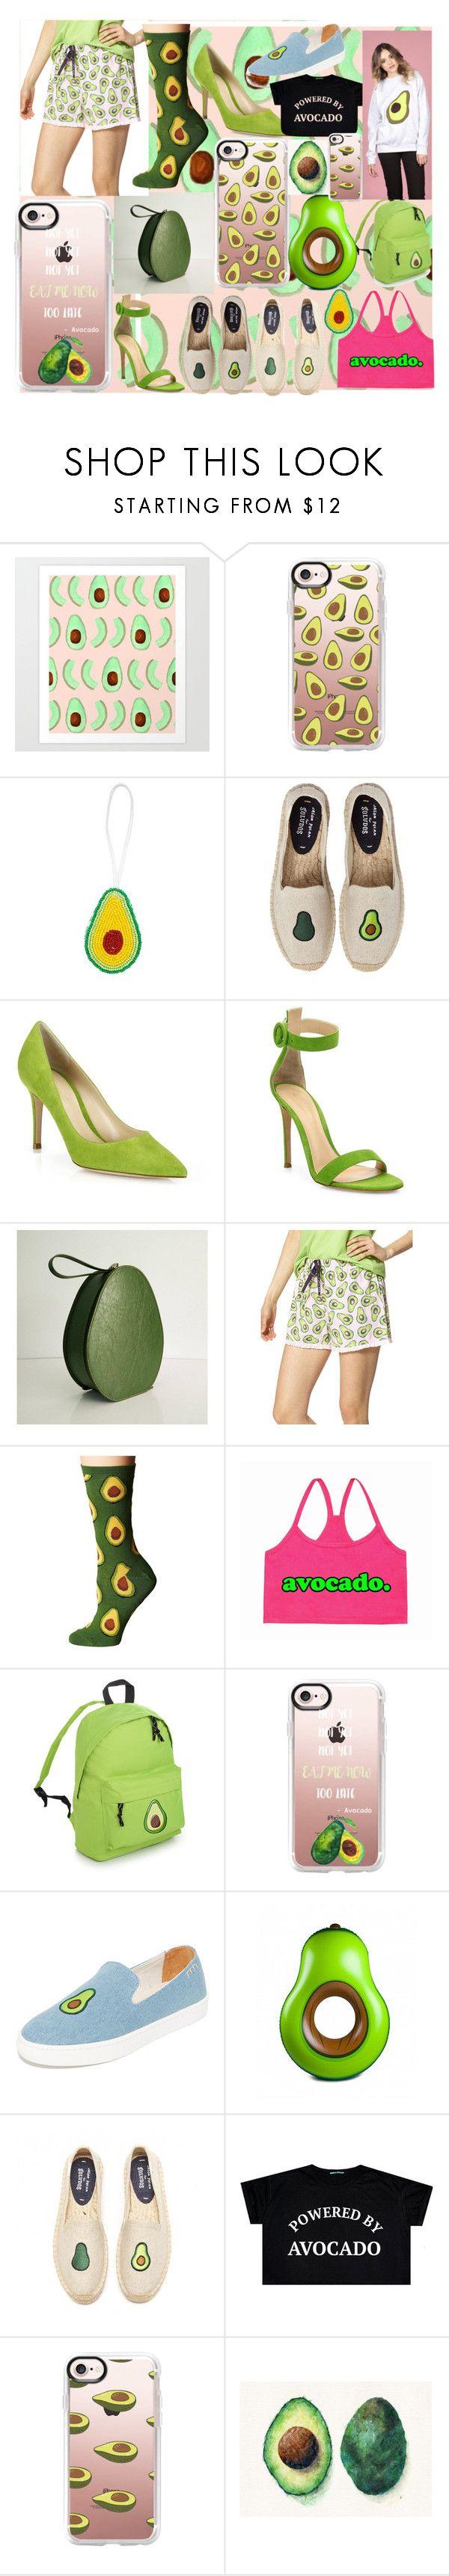 """Avocado"" by andieok on Polyvore featuring Casetify, Soludos, Gianvito Rossi, Hue, Socksmith, BigMouth, Tracie Andrews, McIndoe Design, Avocado and avo"